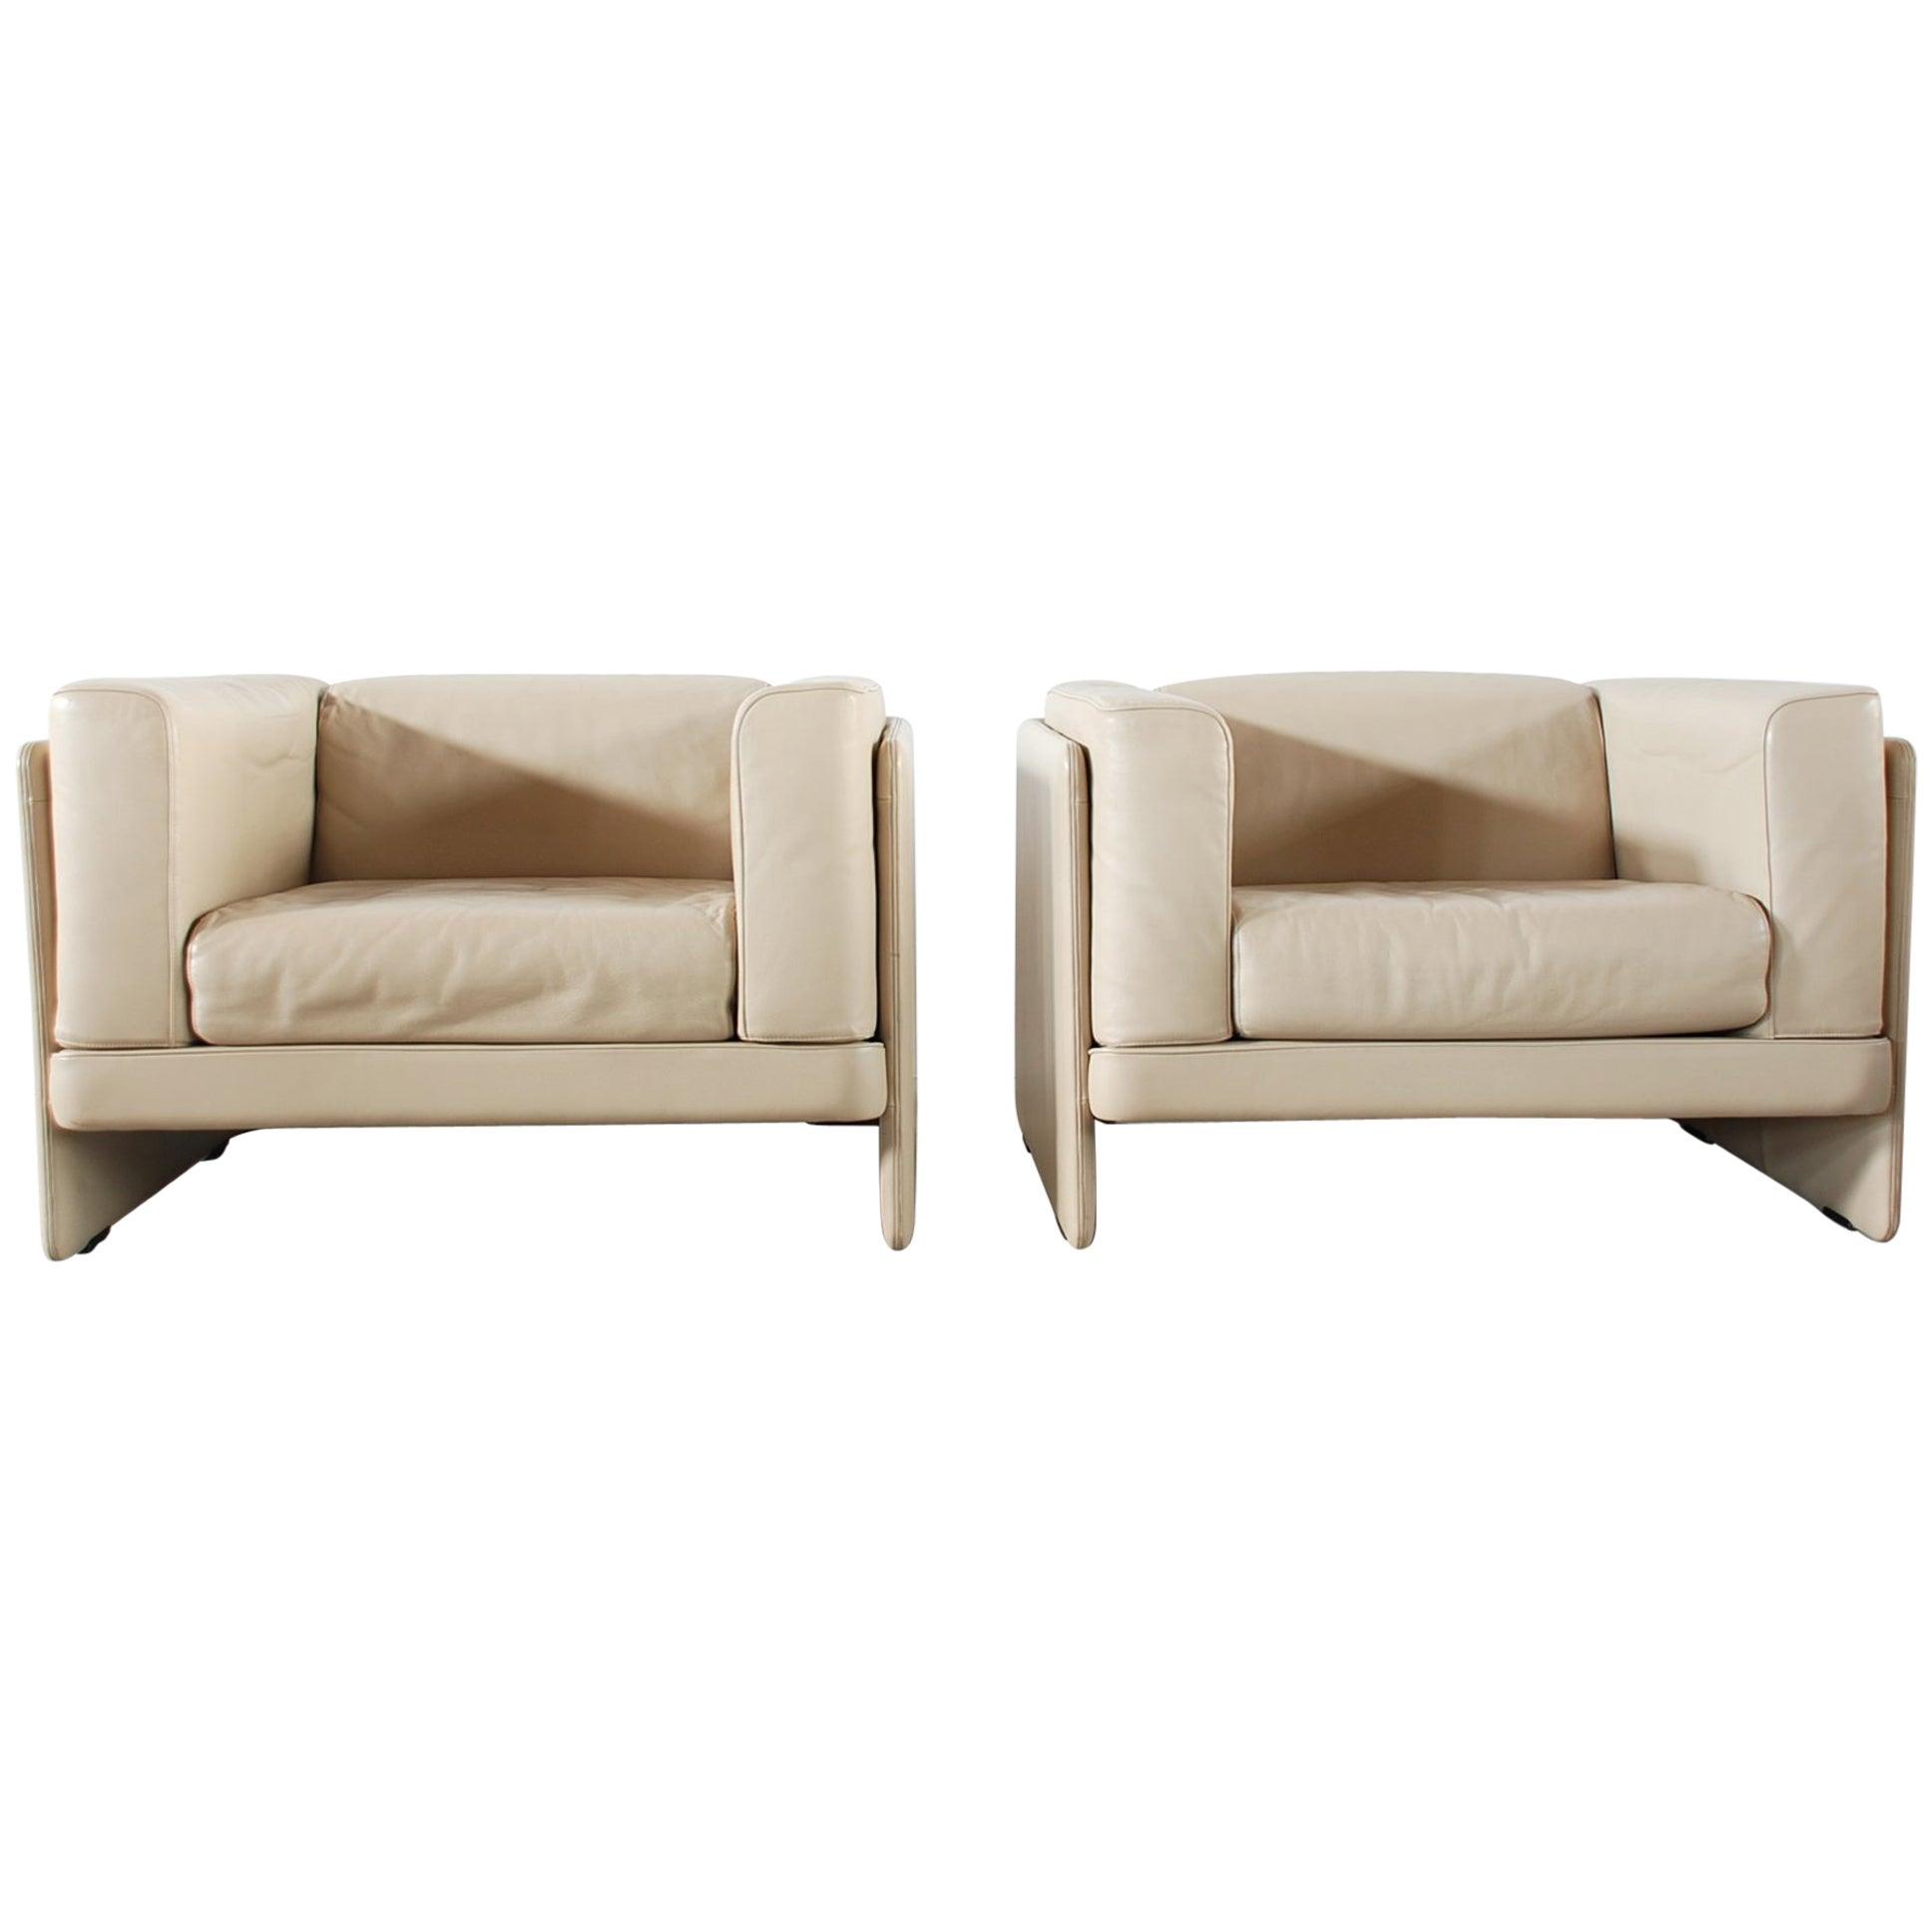 Poltrona Frau Armchair Chair Model La Capanelle by Tito Angoli